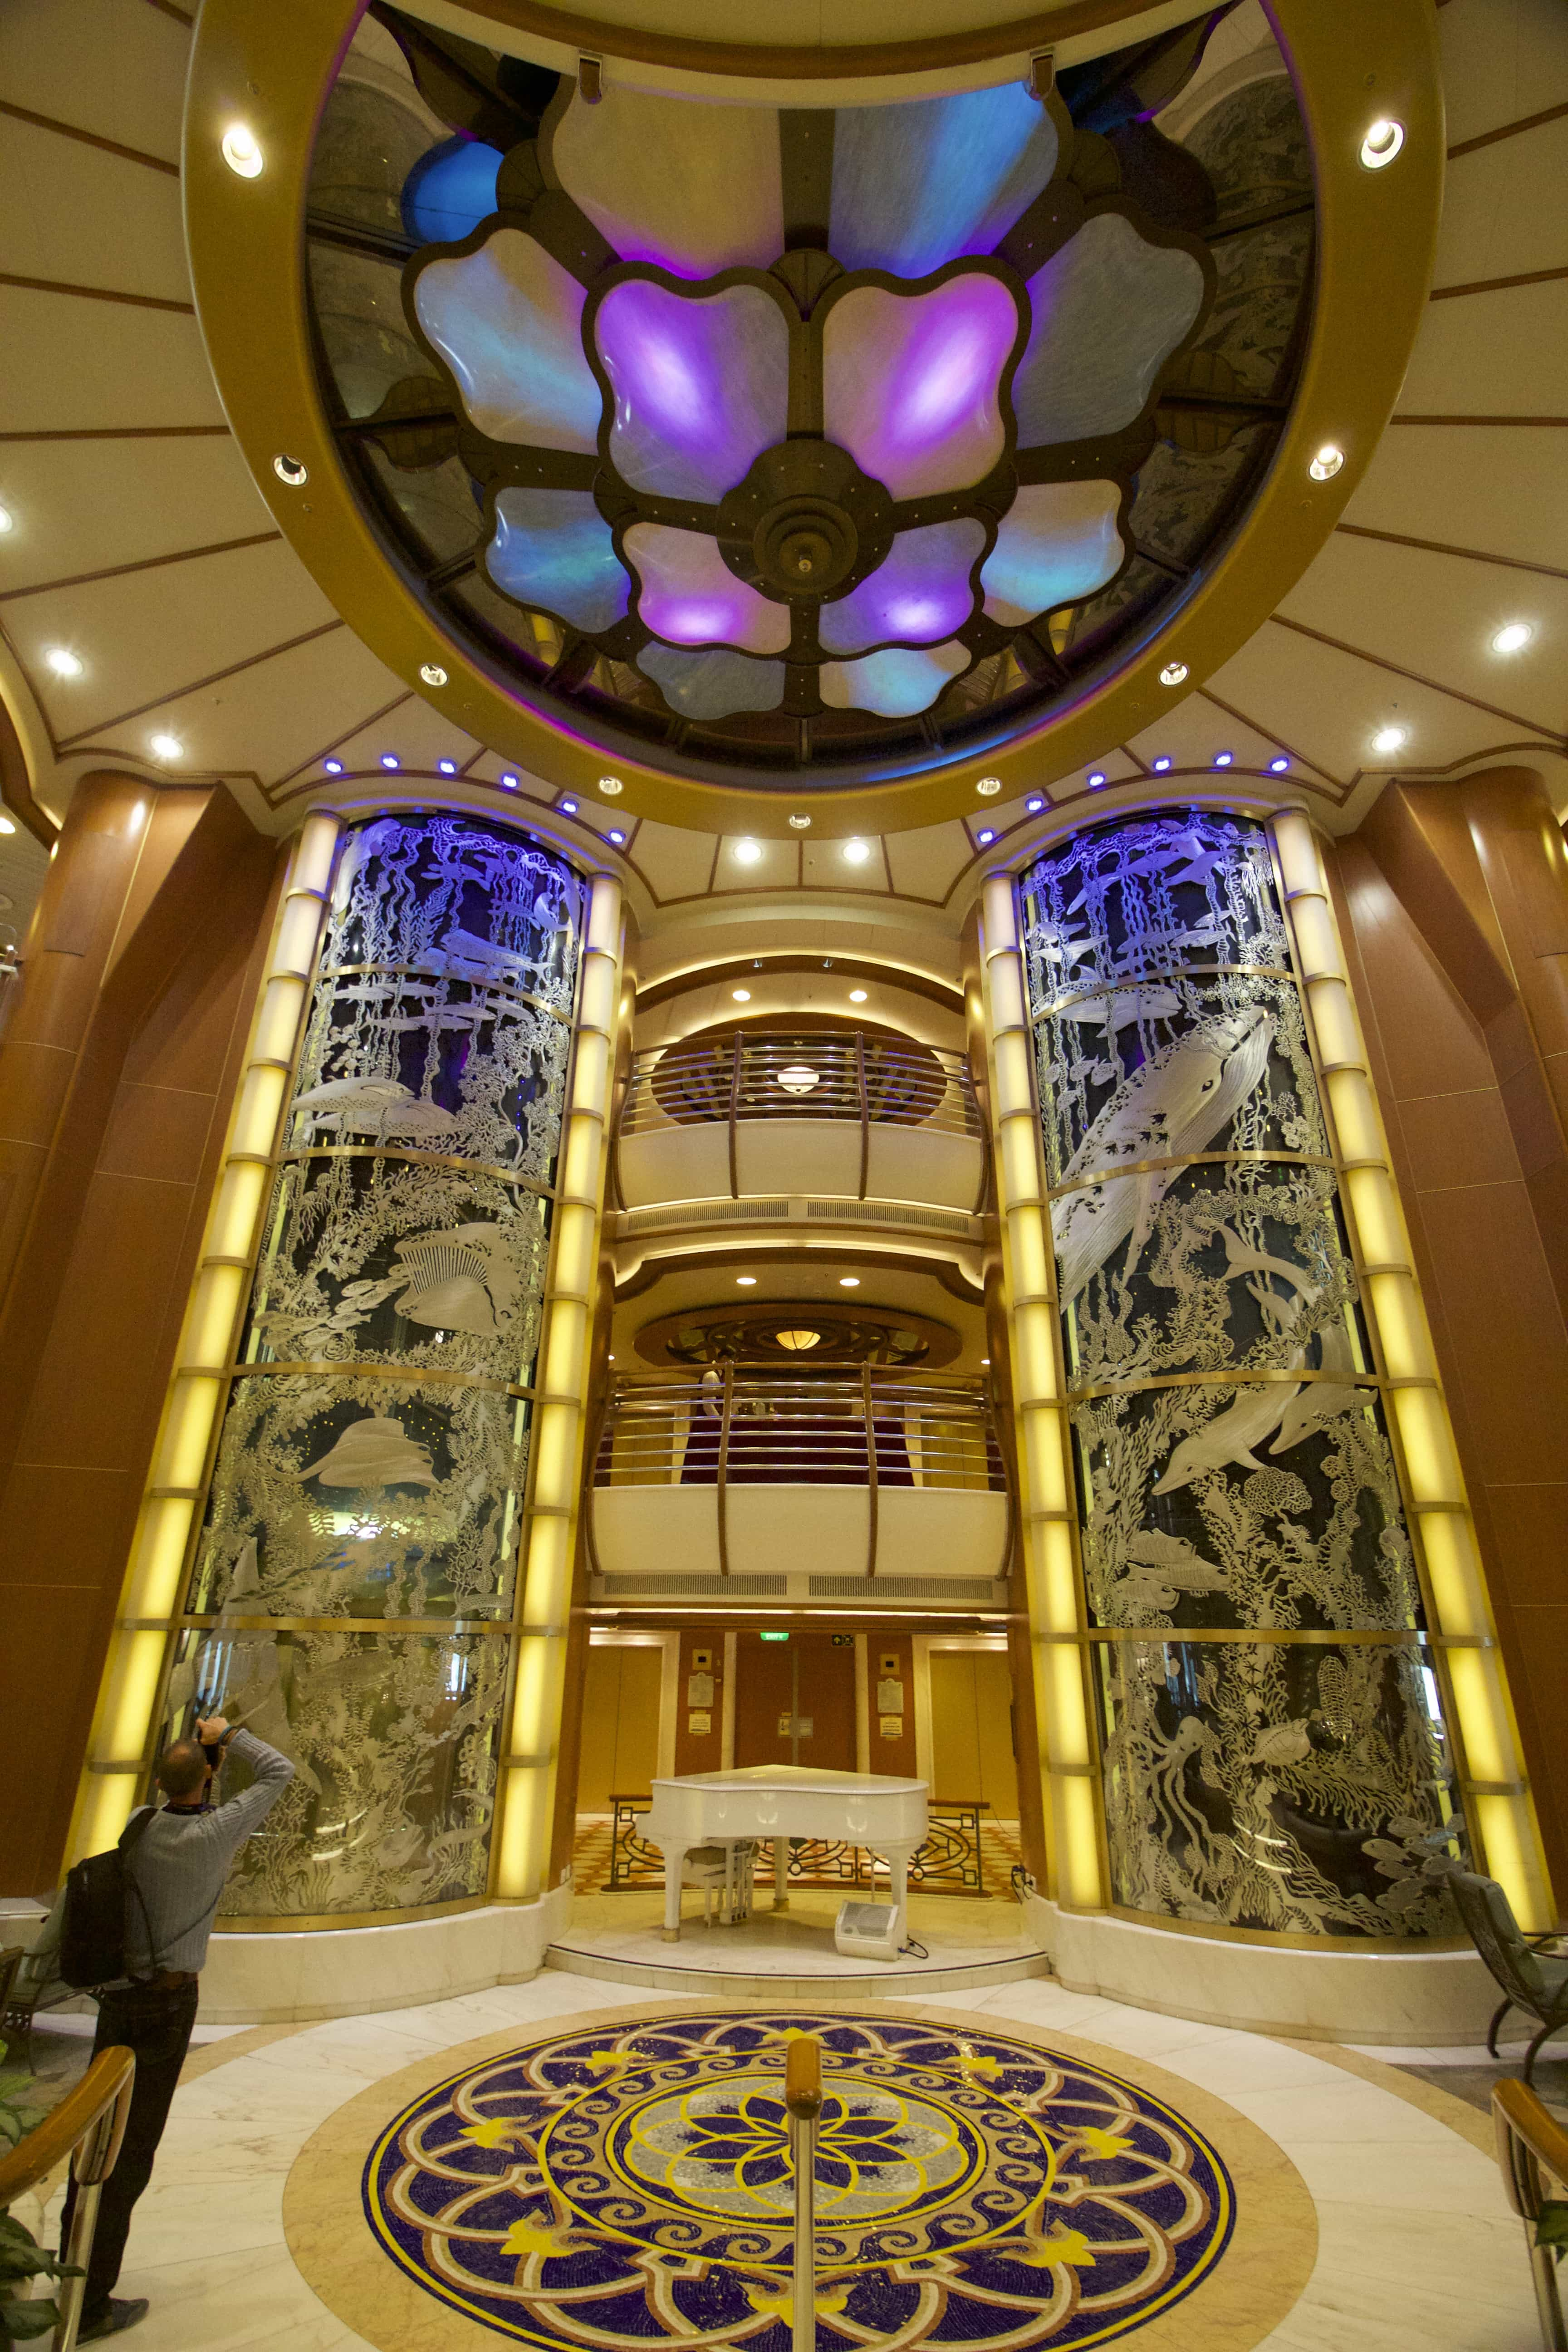 Caribbean Princess Atrium/Piazza Glass Lifts Grand Piano Lights